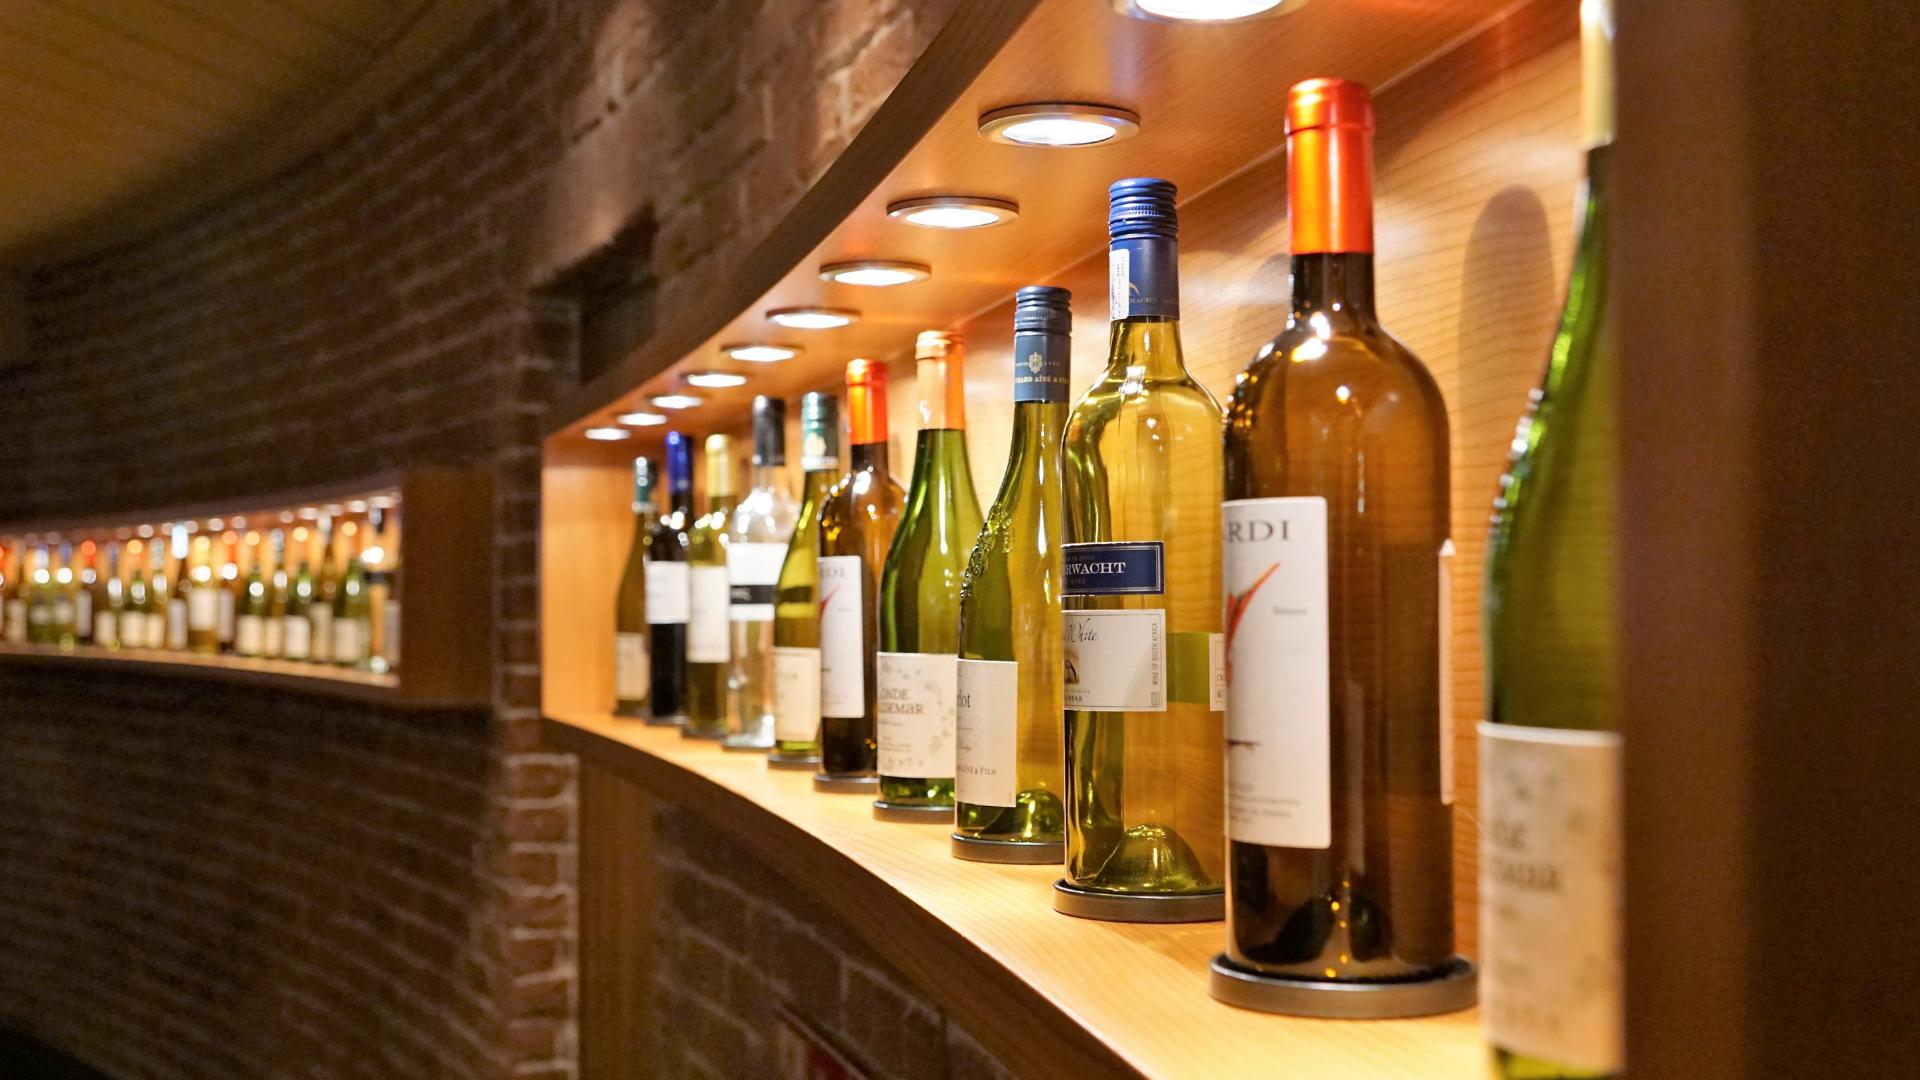 белые вина на полке